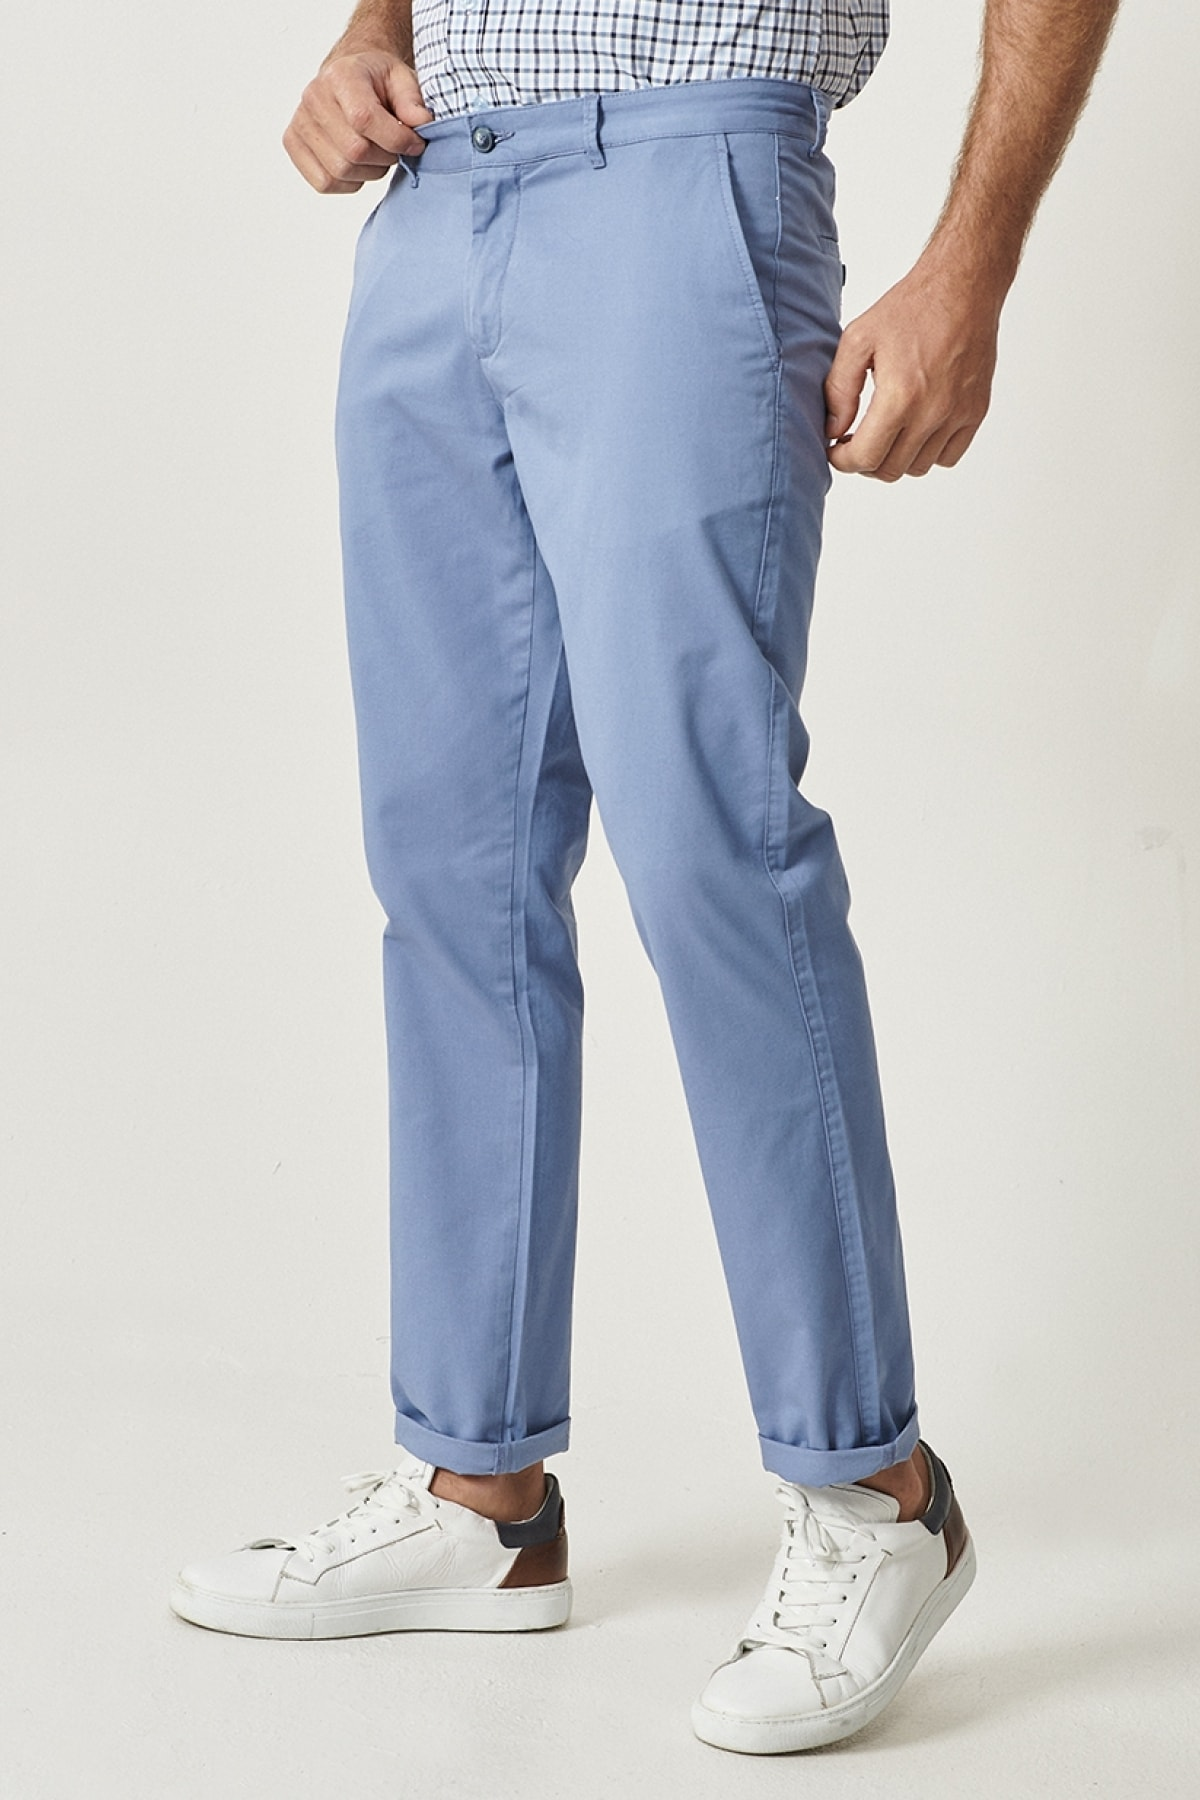 ALTINYILDIZ CLASSICS Erkek Mavi Kanvas Slim Fit Chino Pantolon 1